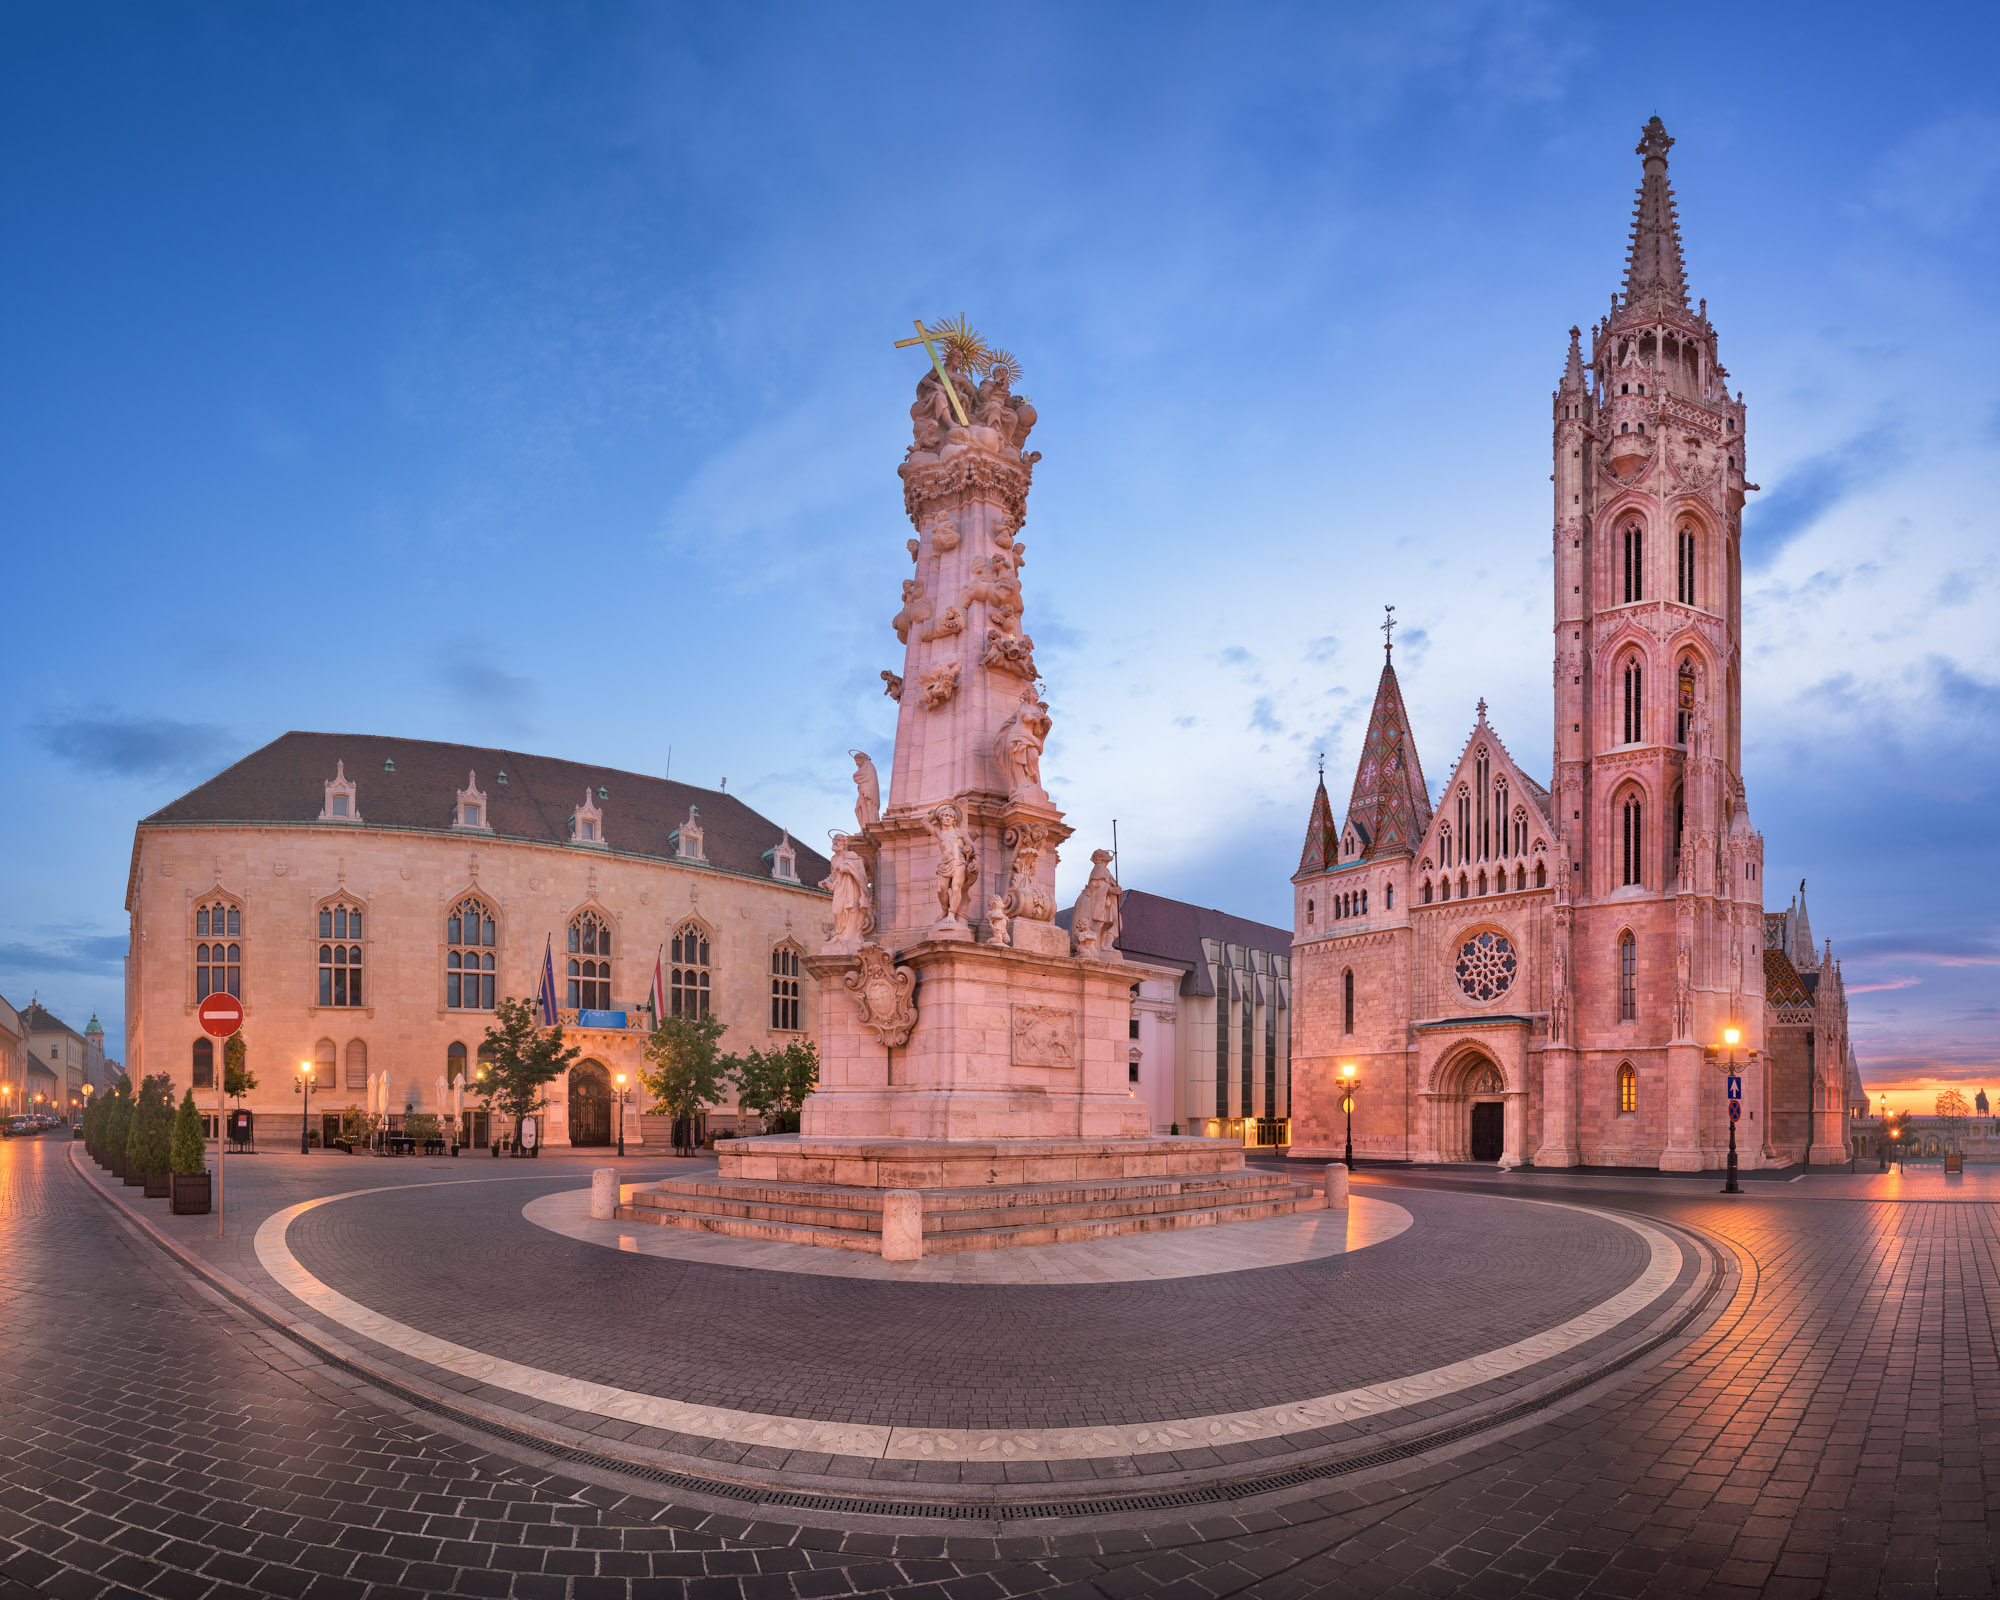 Saint Matthias Church and Trinity Square, Budapest, Hungary